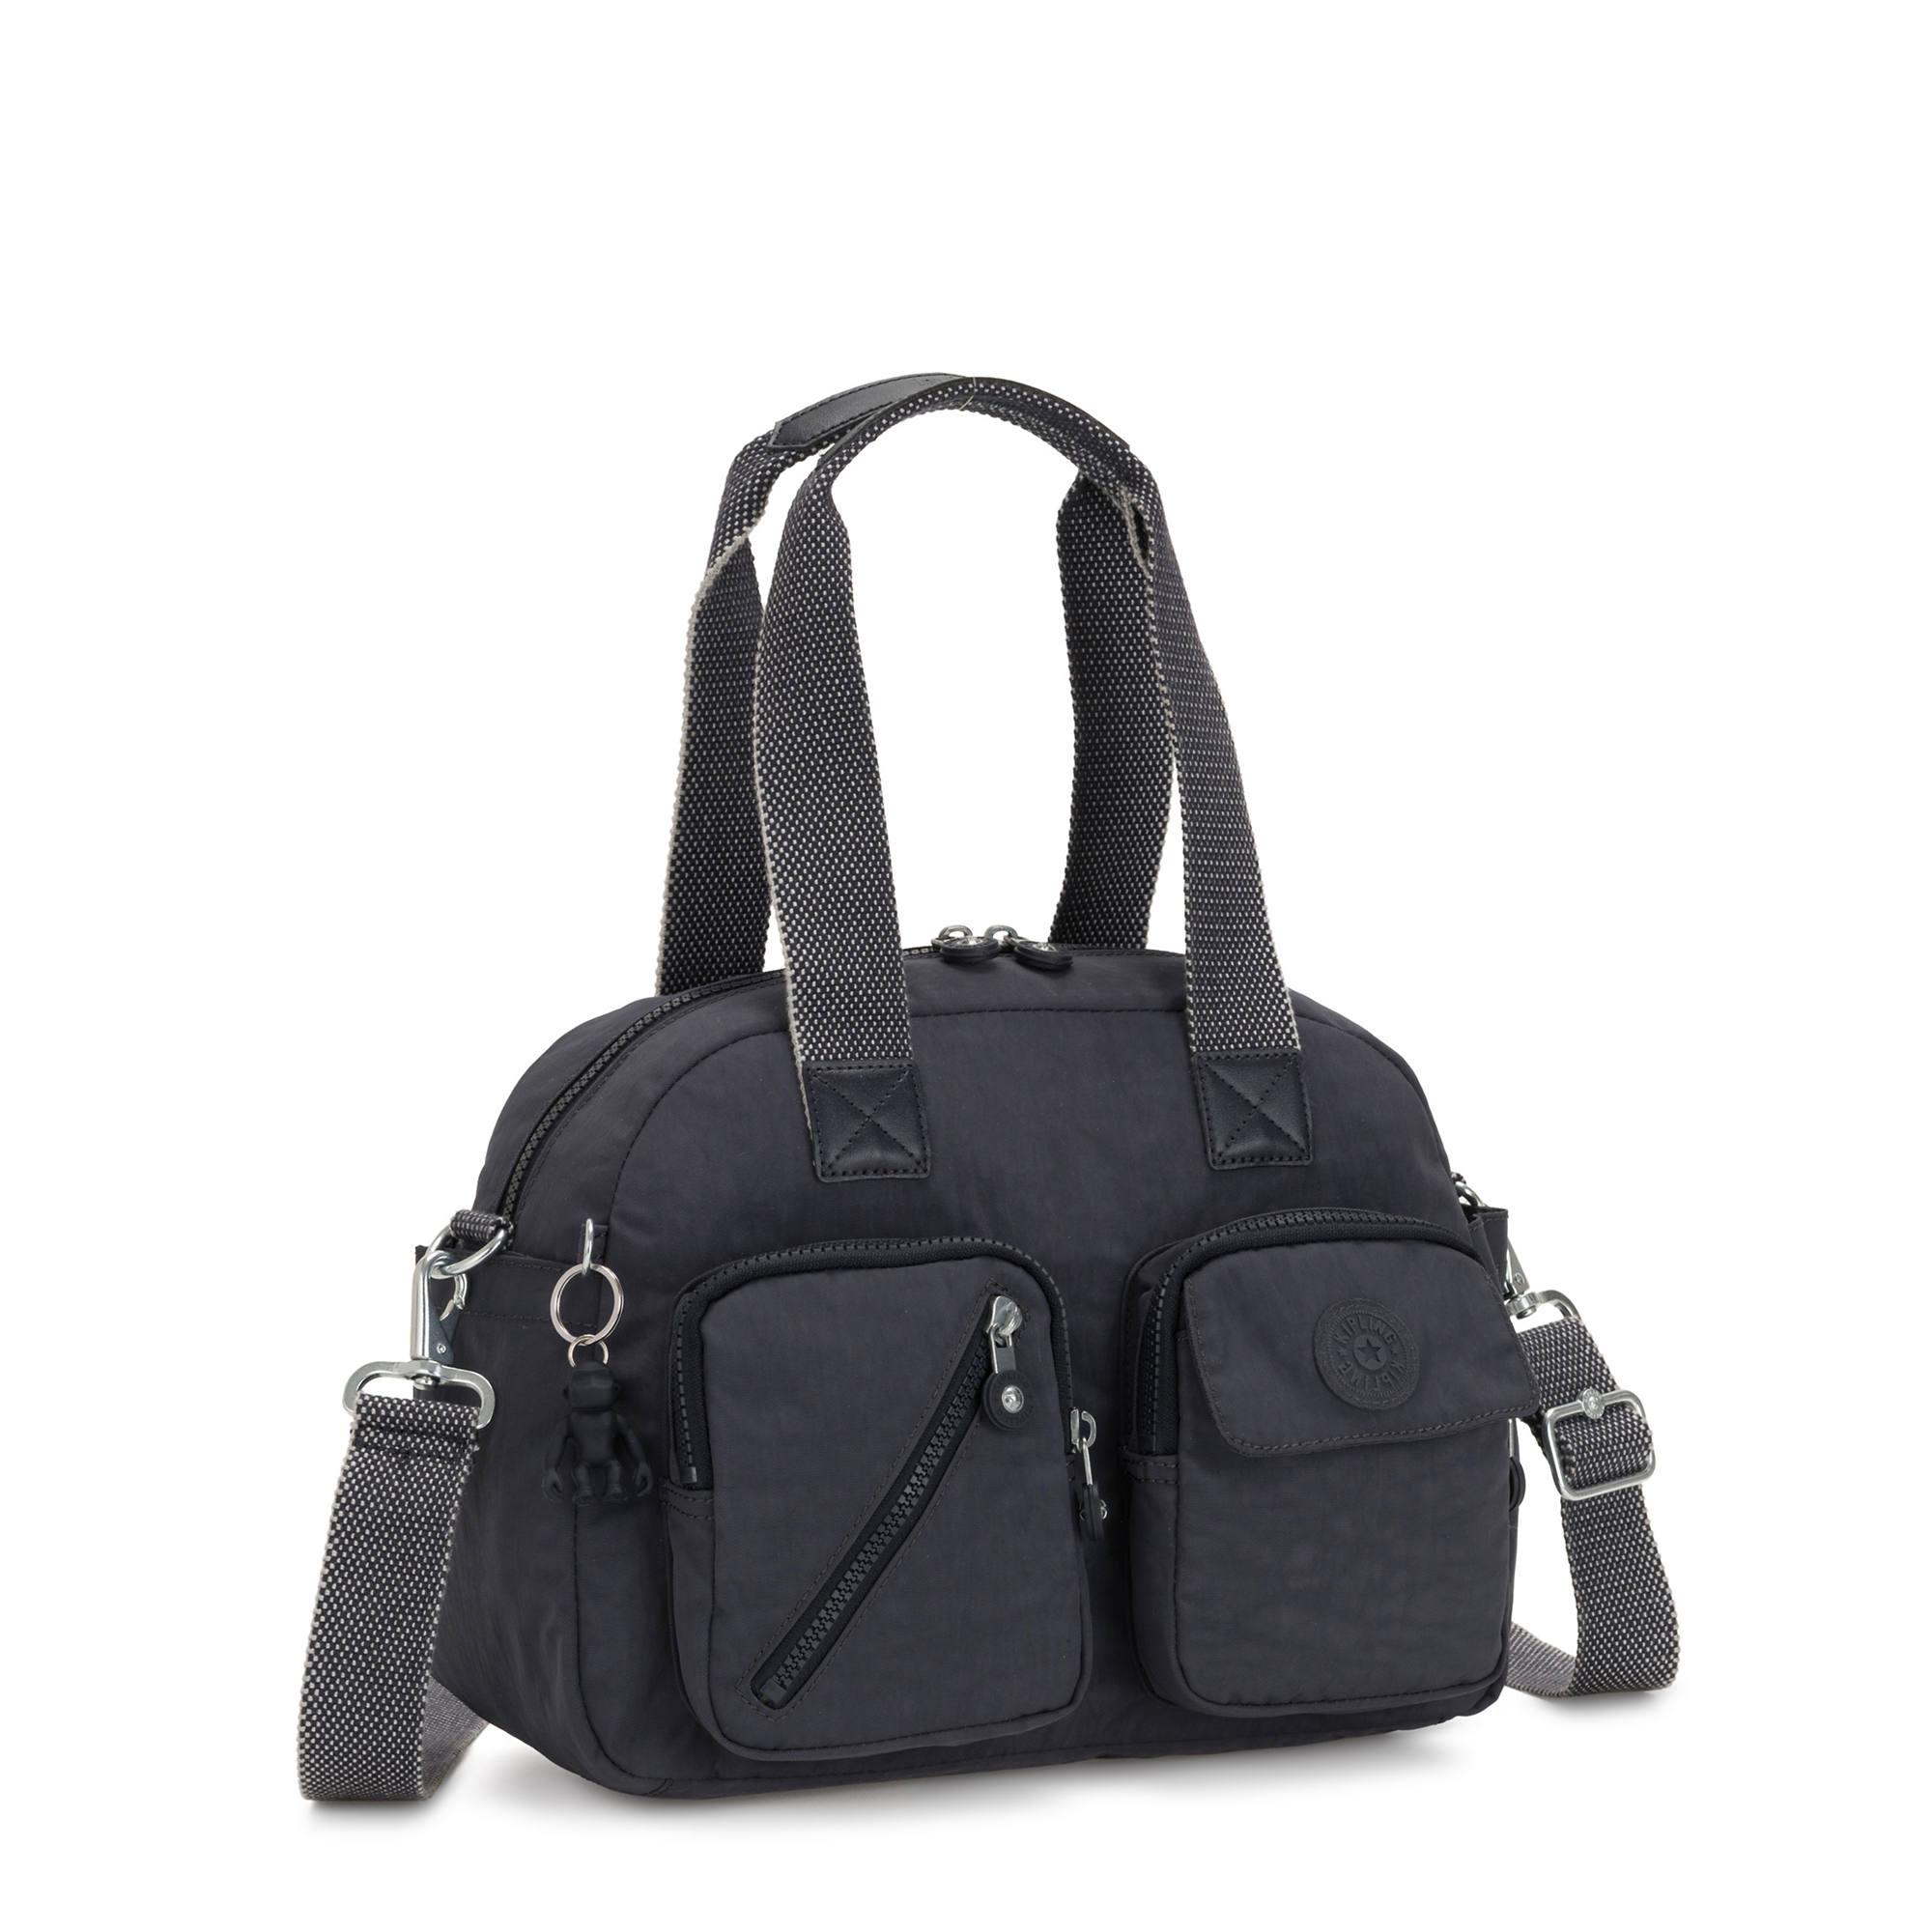 Kipling-Defea-Handbag miniatura 12